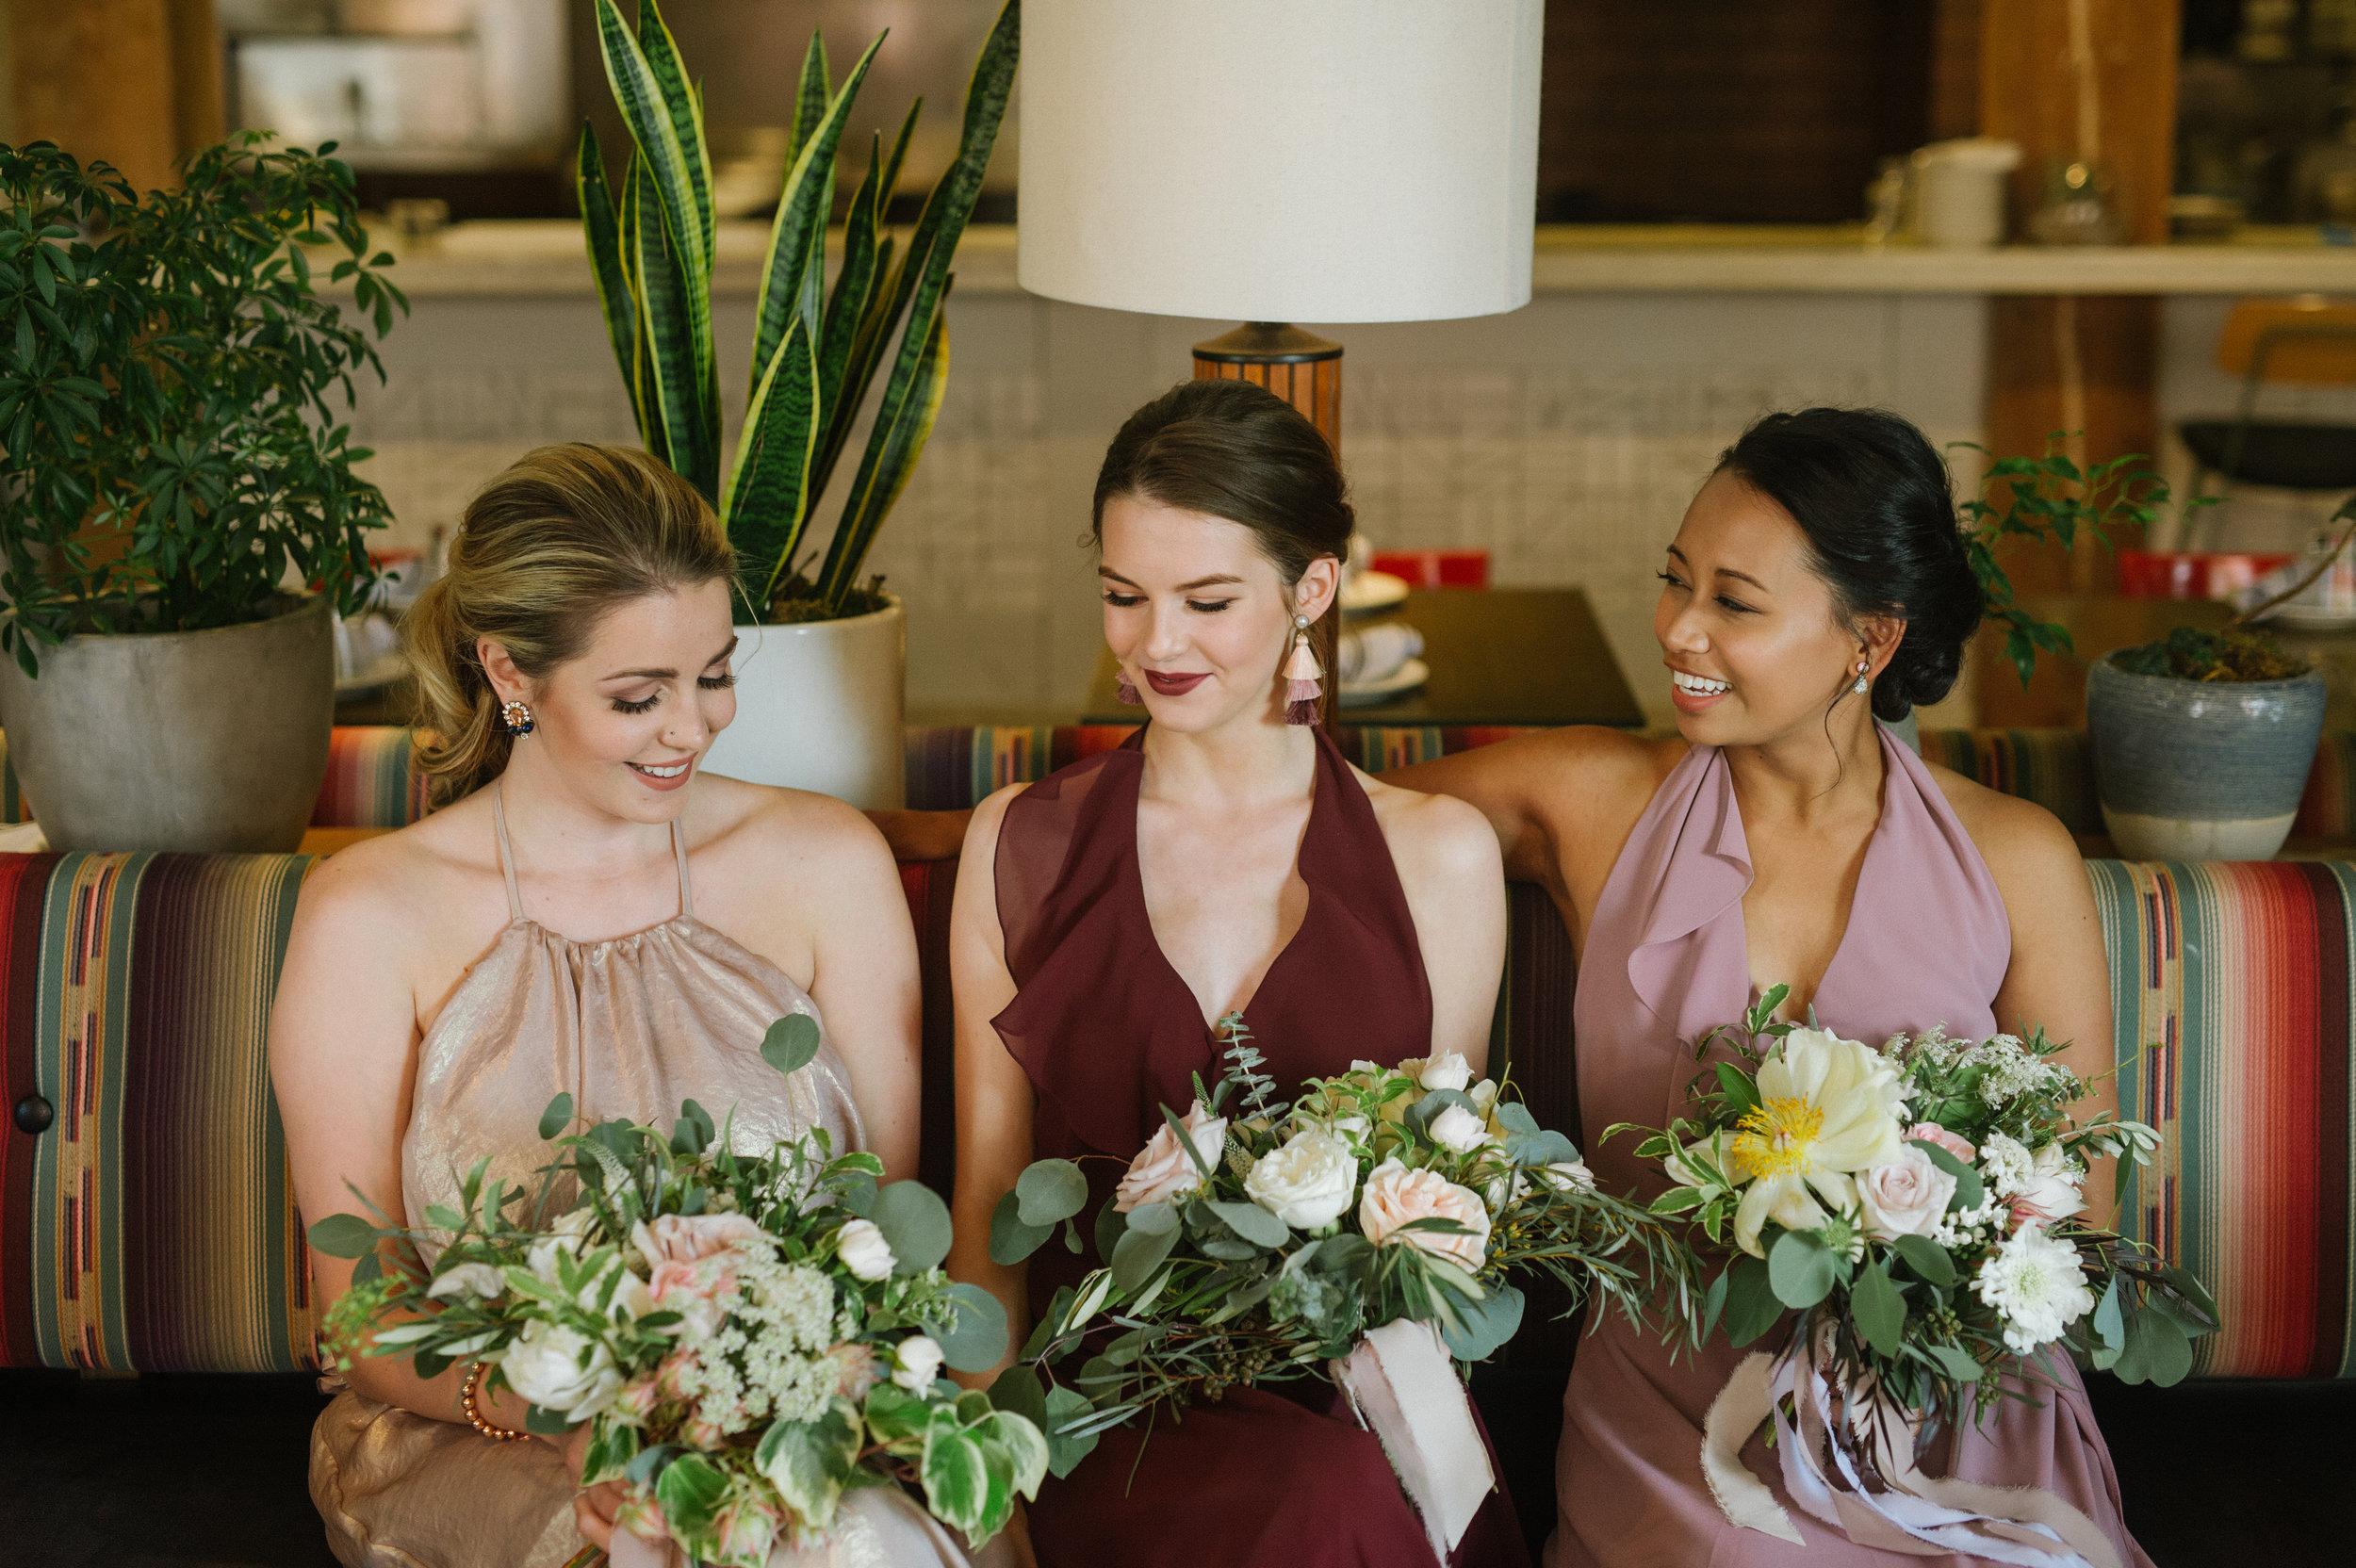 Calgary_Wedding_Photography_Bridgette_Bar_Bridesmaids_Shoot_2018_HR030.jpg